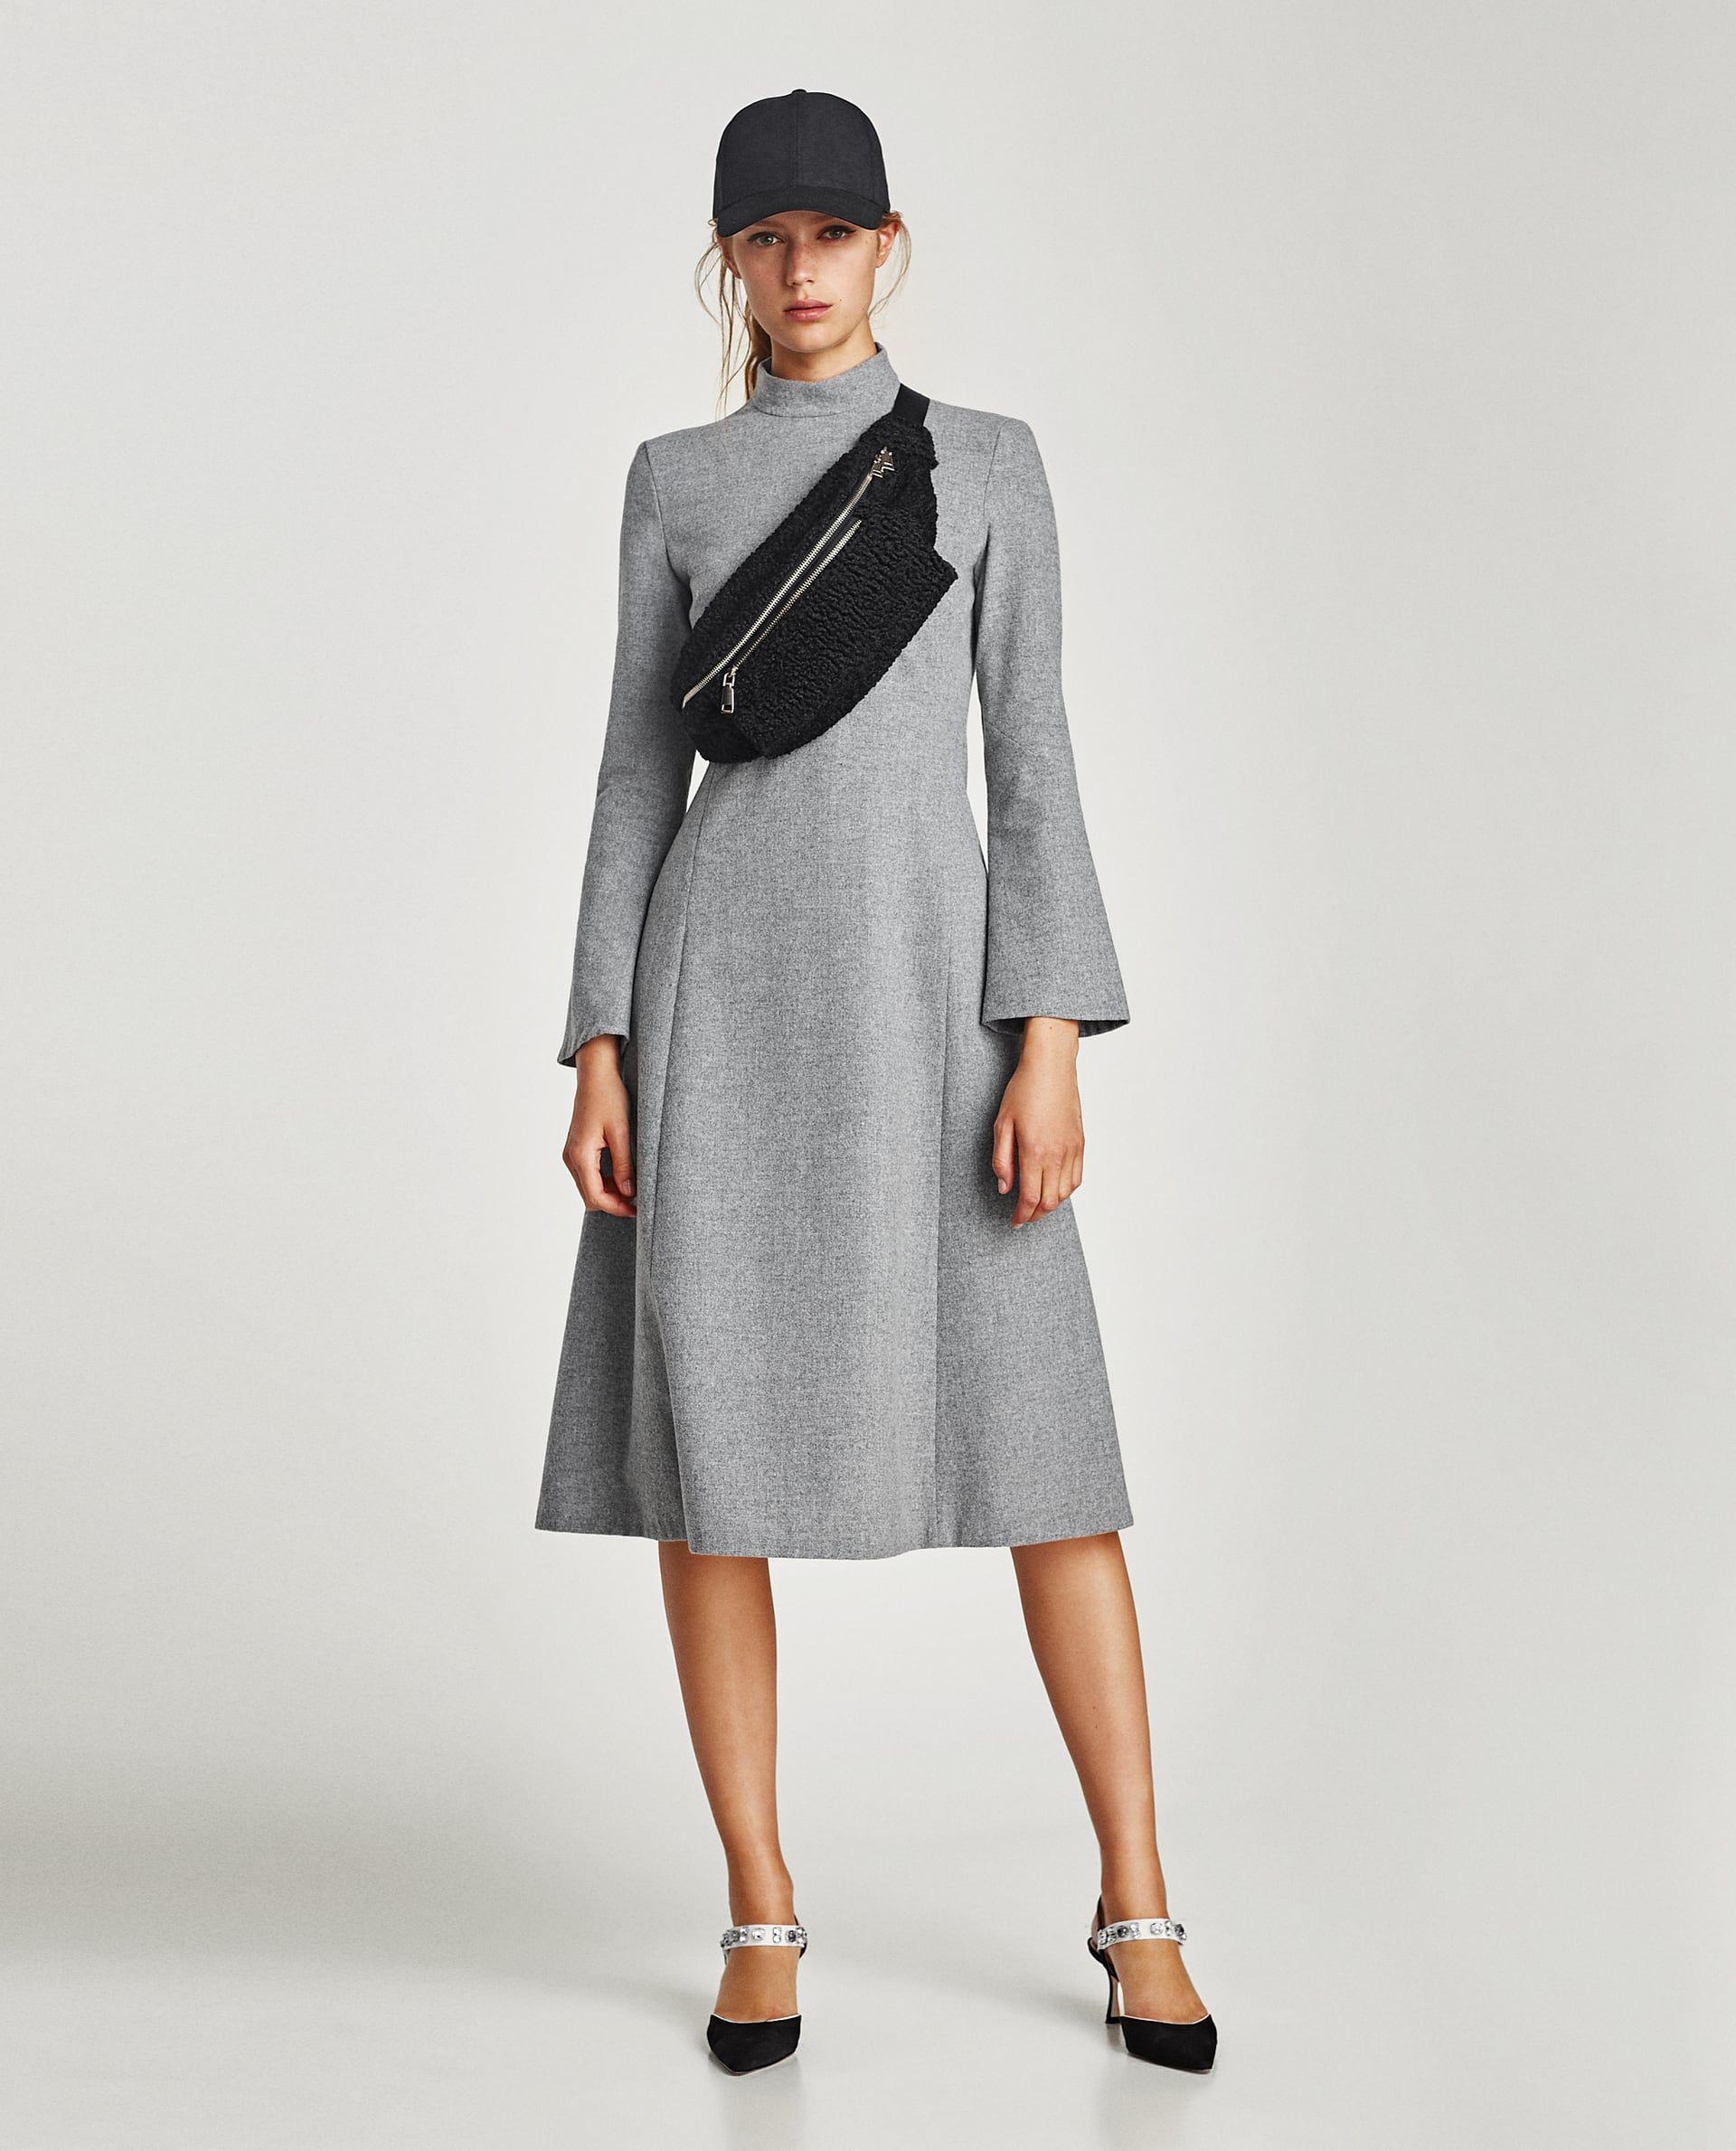 Zara  Woman  Long Sleeve Midi Dress  Midikleider